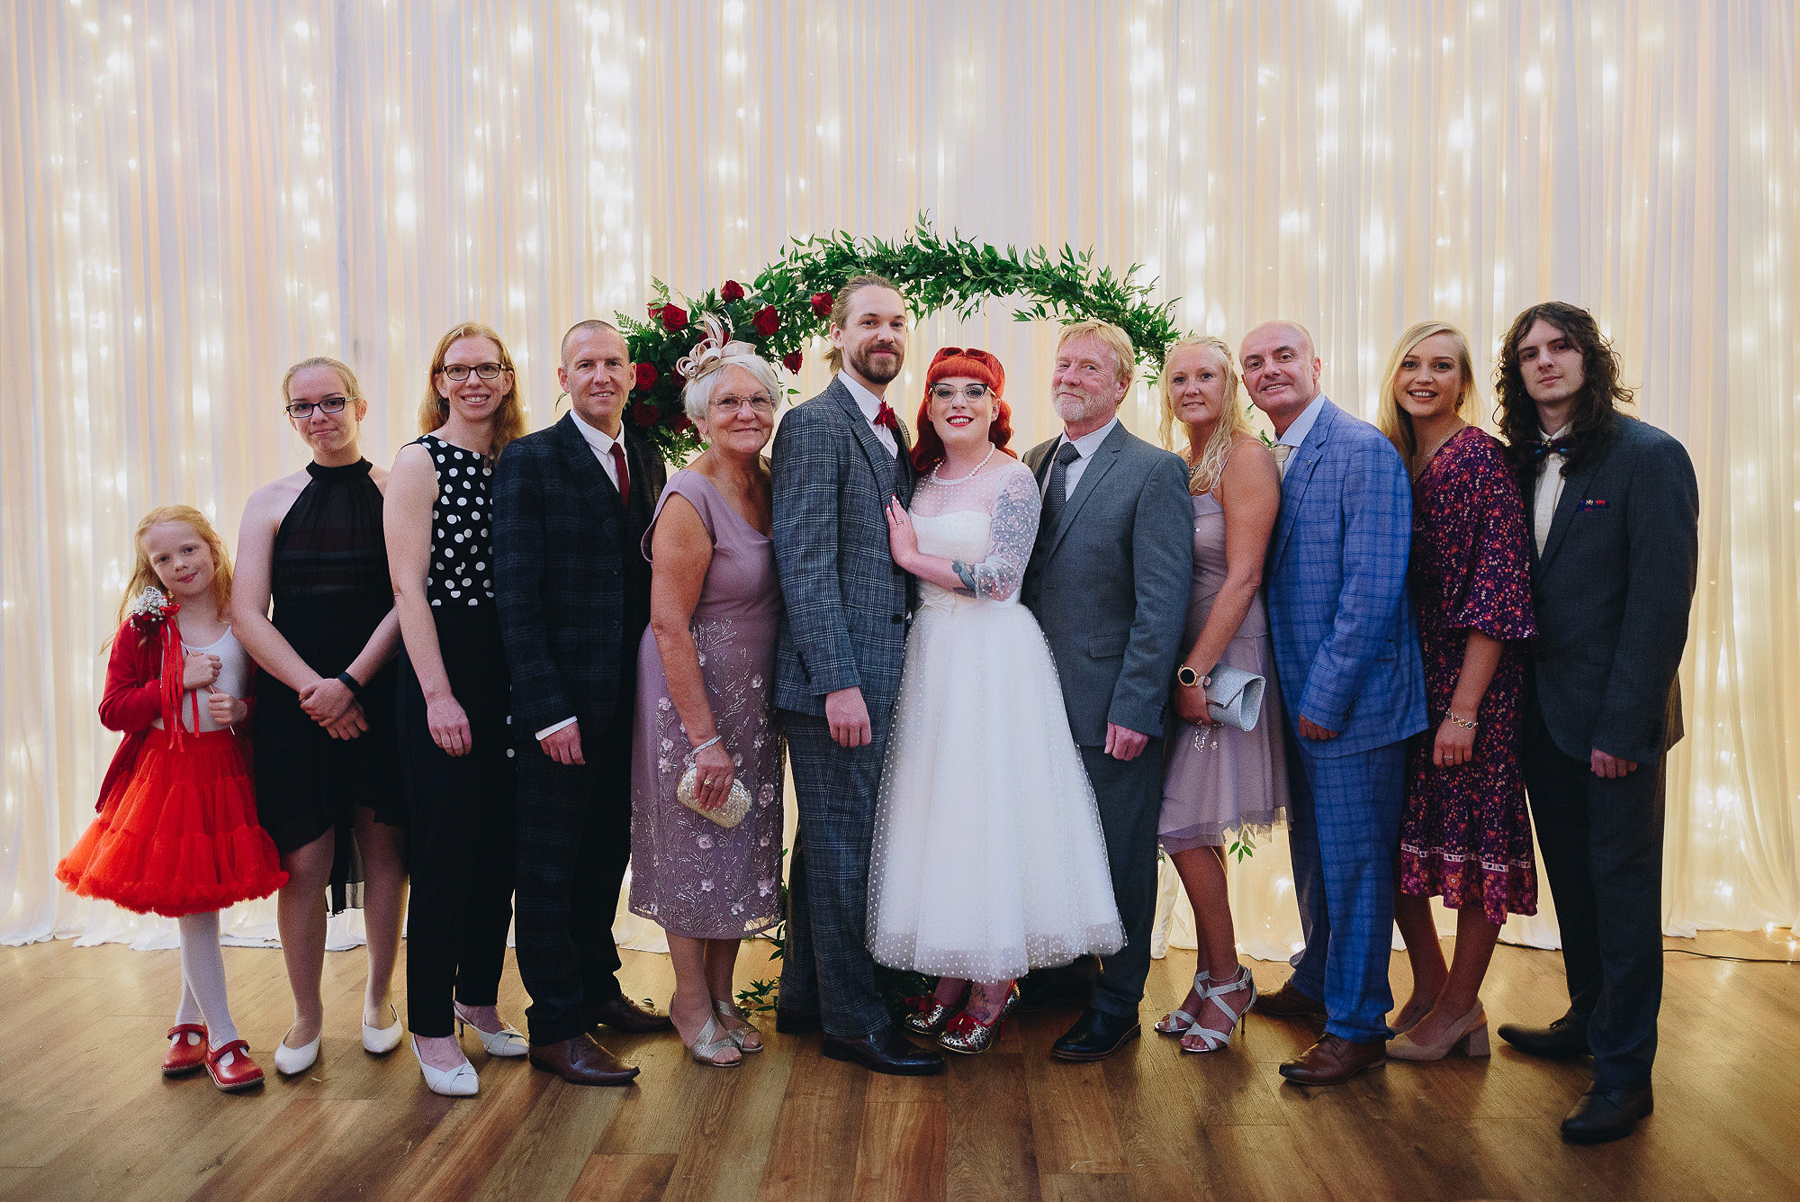 Wellbeing_Farm_Wedding_Photography_The_Pin-Up_Bride_Lara_Shaun-101.jpg